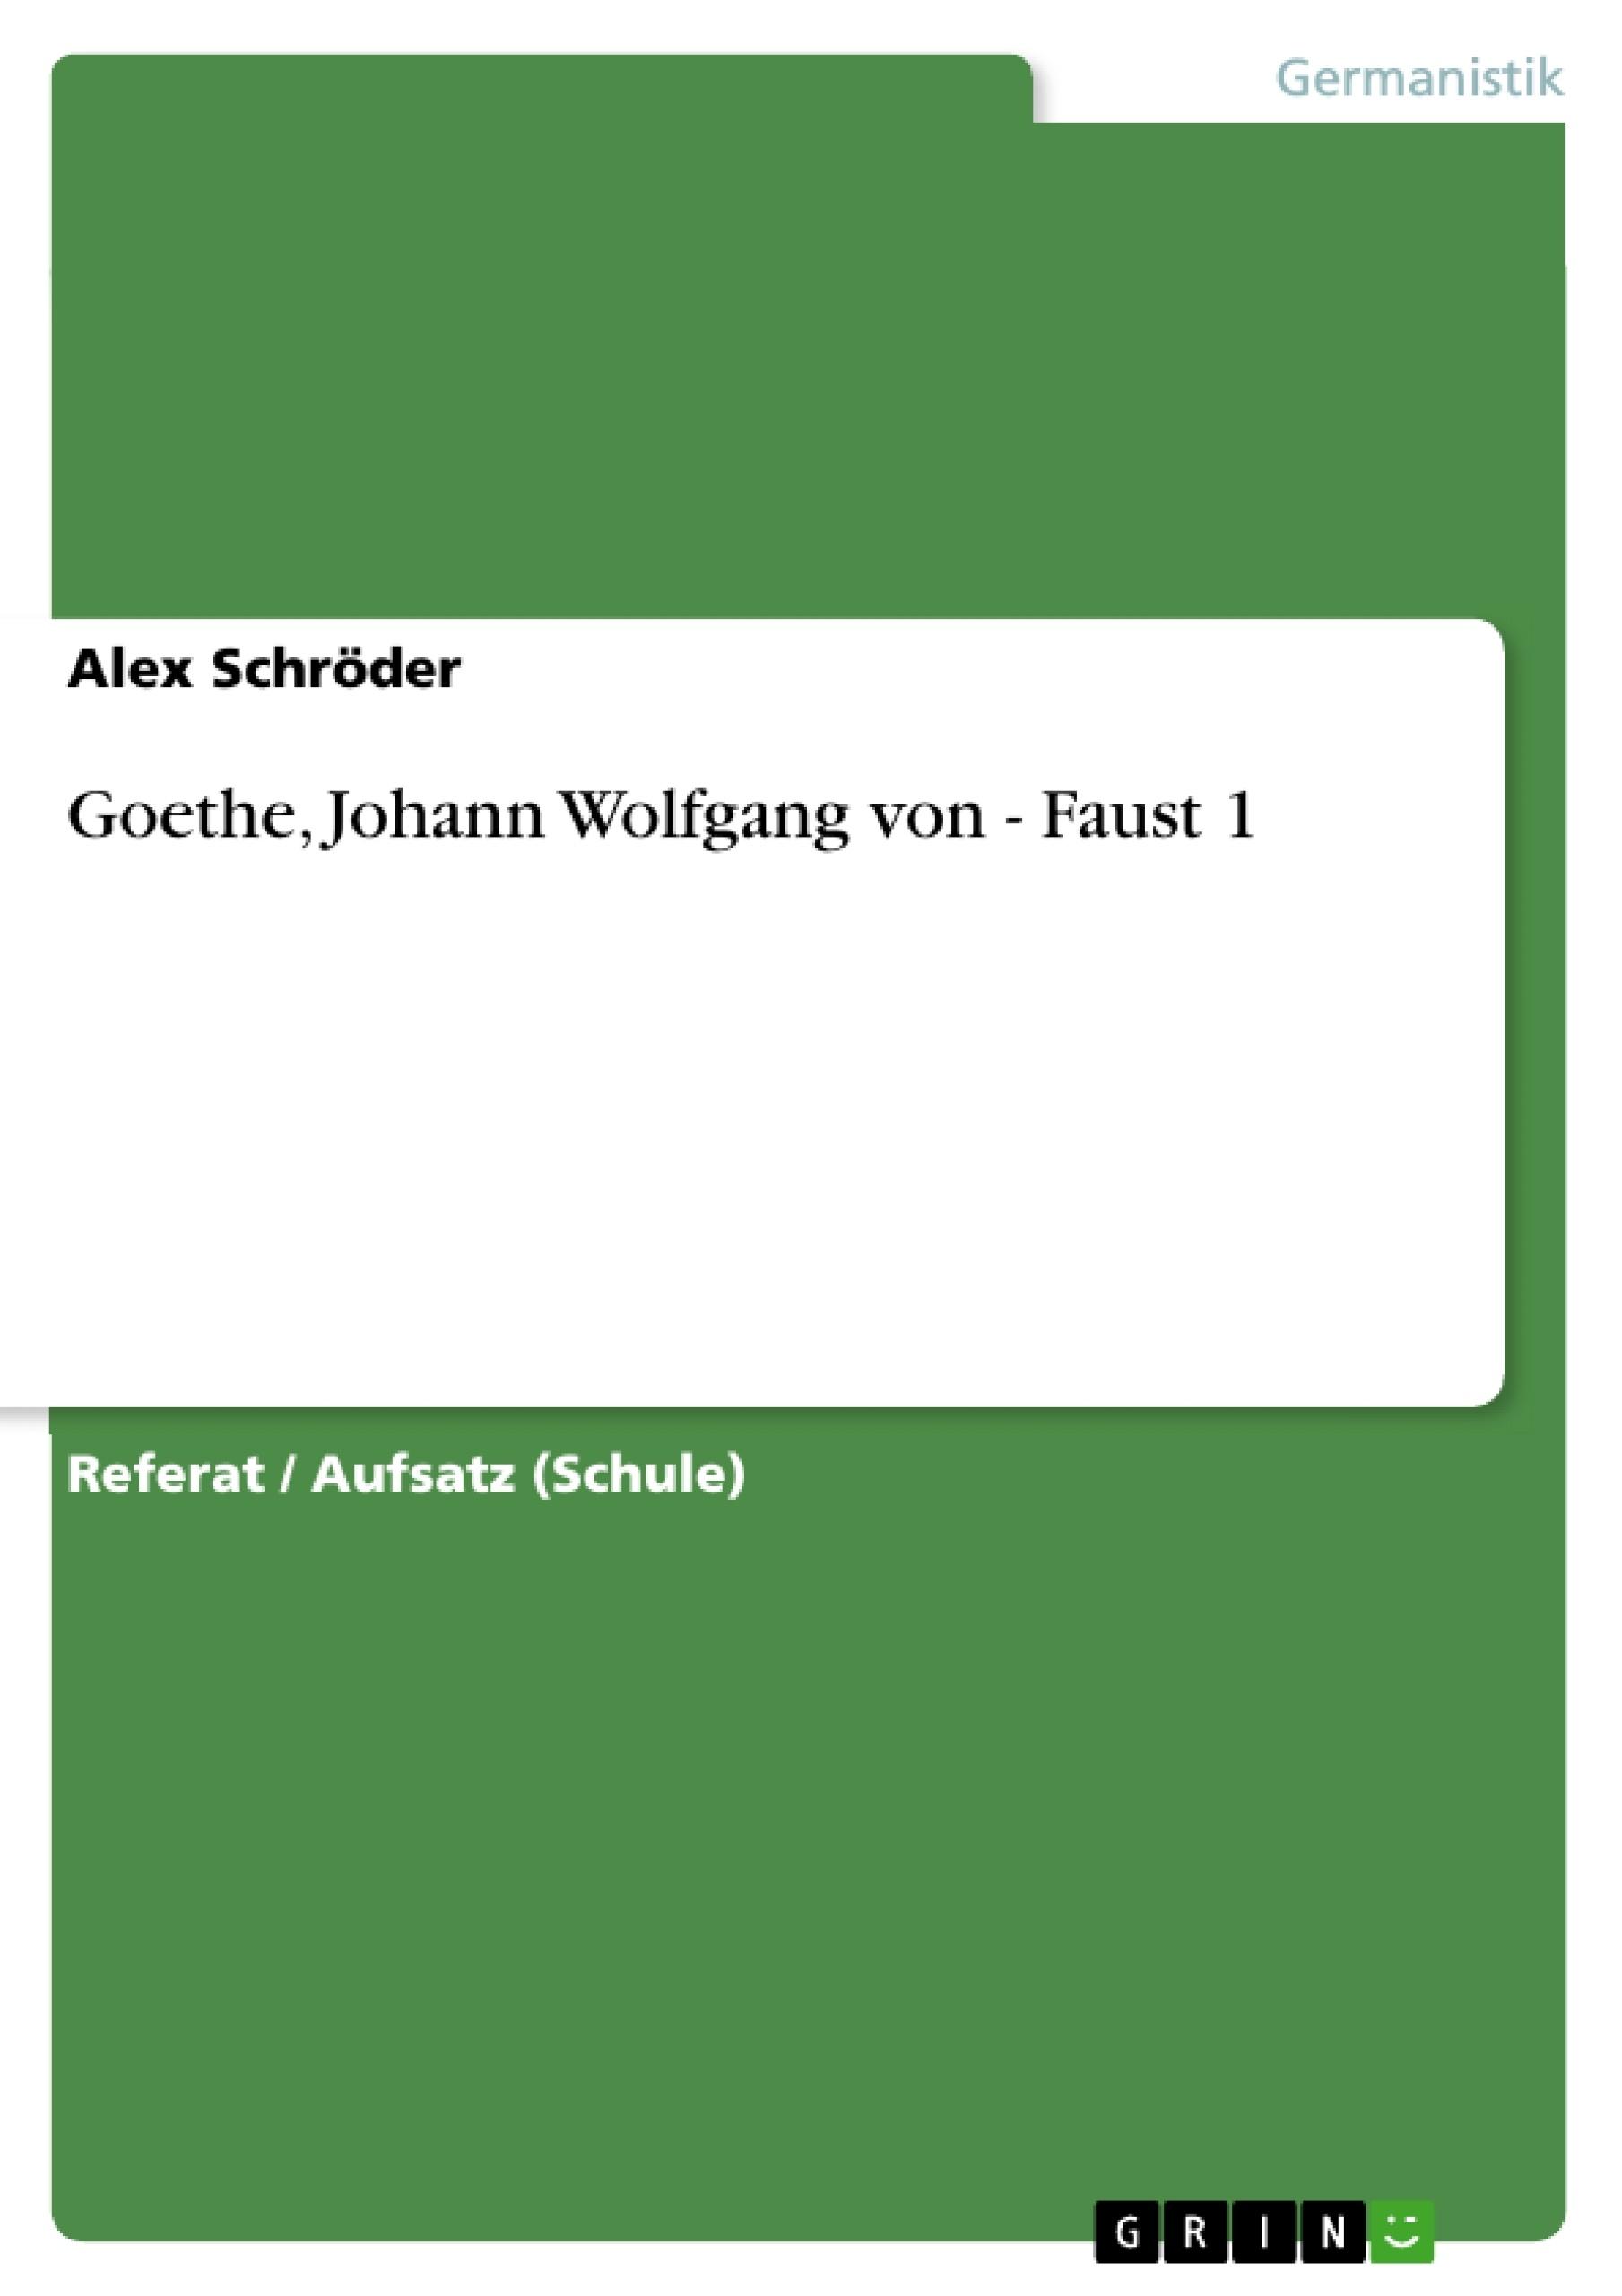 Titel: Goethe, Johann Wolfgang von - Faust 1